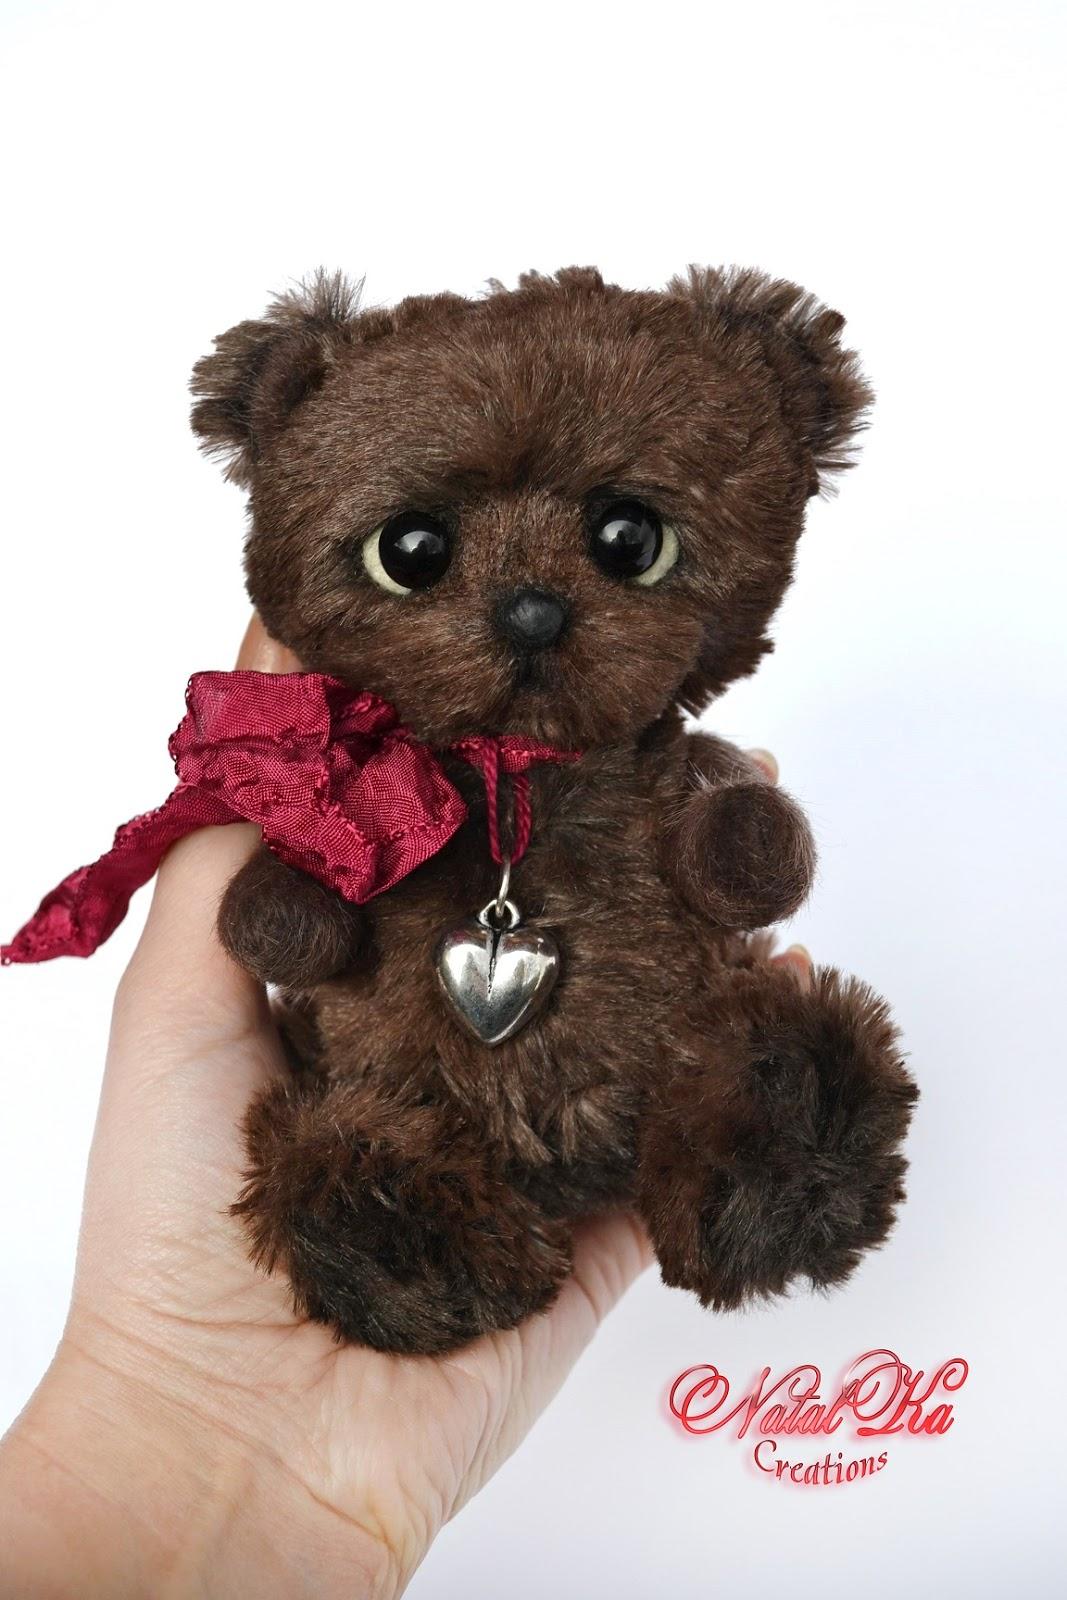 Artist teddy bear, teddies, artist bear, teddy, ooak, handmade by NatalKa Creations. Авторский медвежонок тедди с шармом, мишка тедди, медведь тедди, ручная работа, единственный экземпляр от NatalKa Creations.